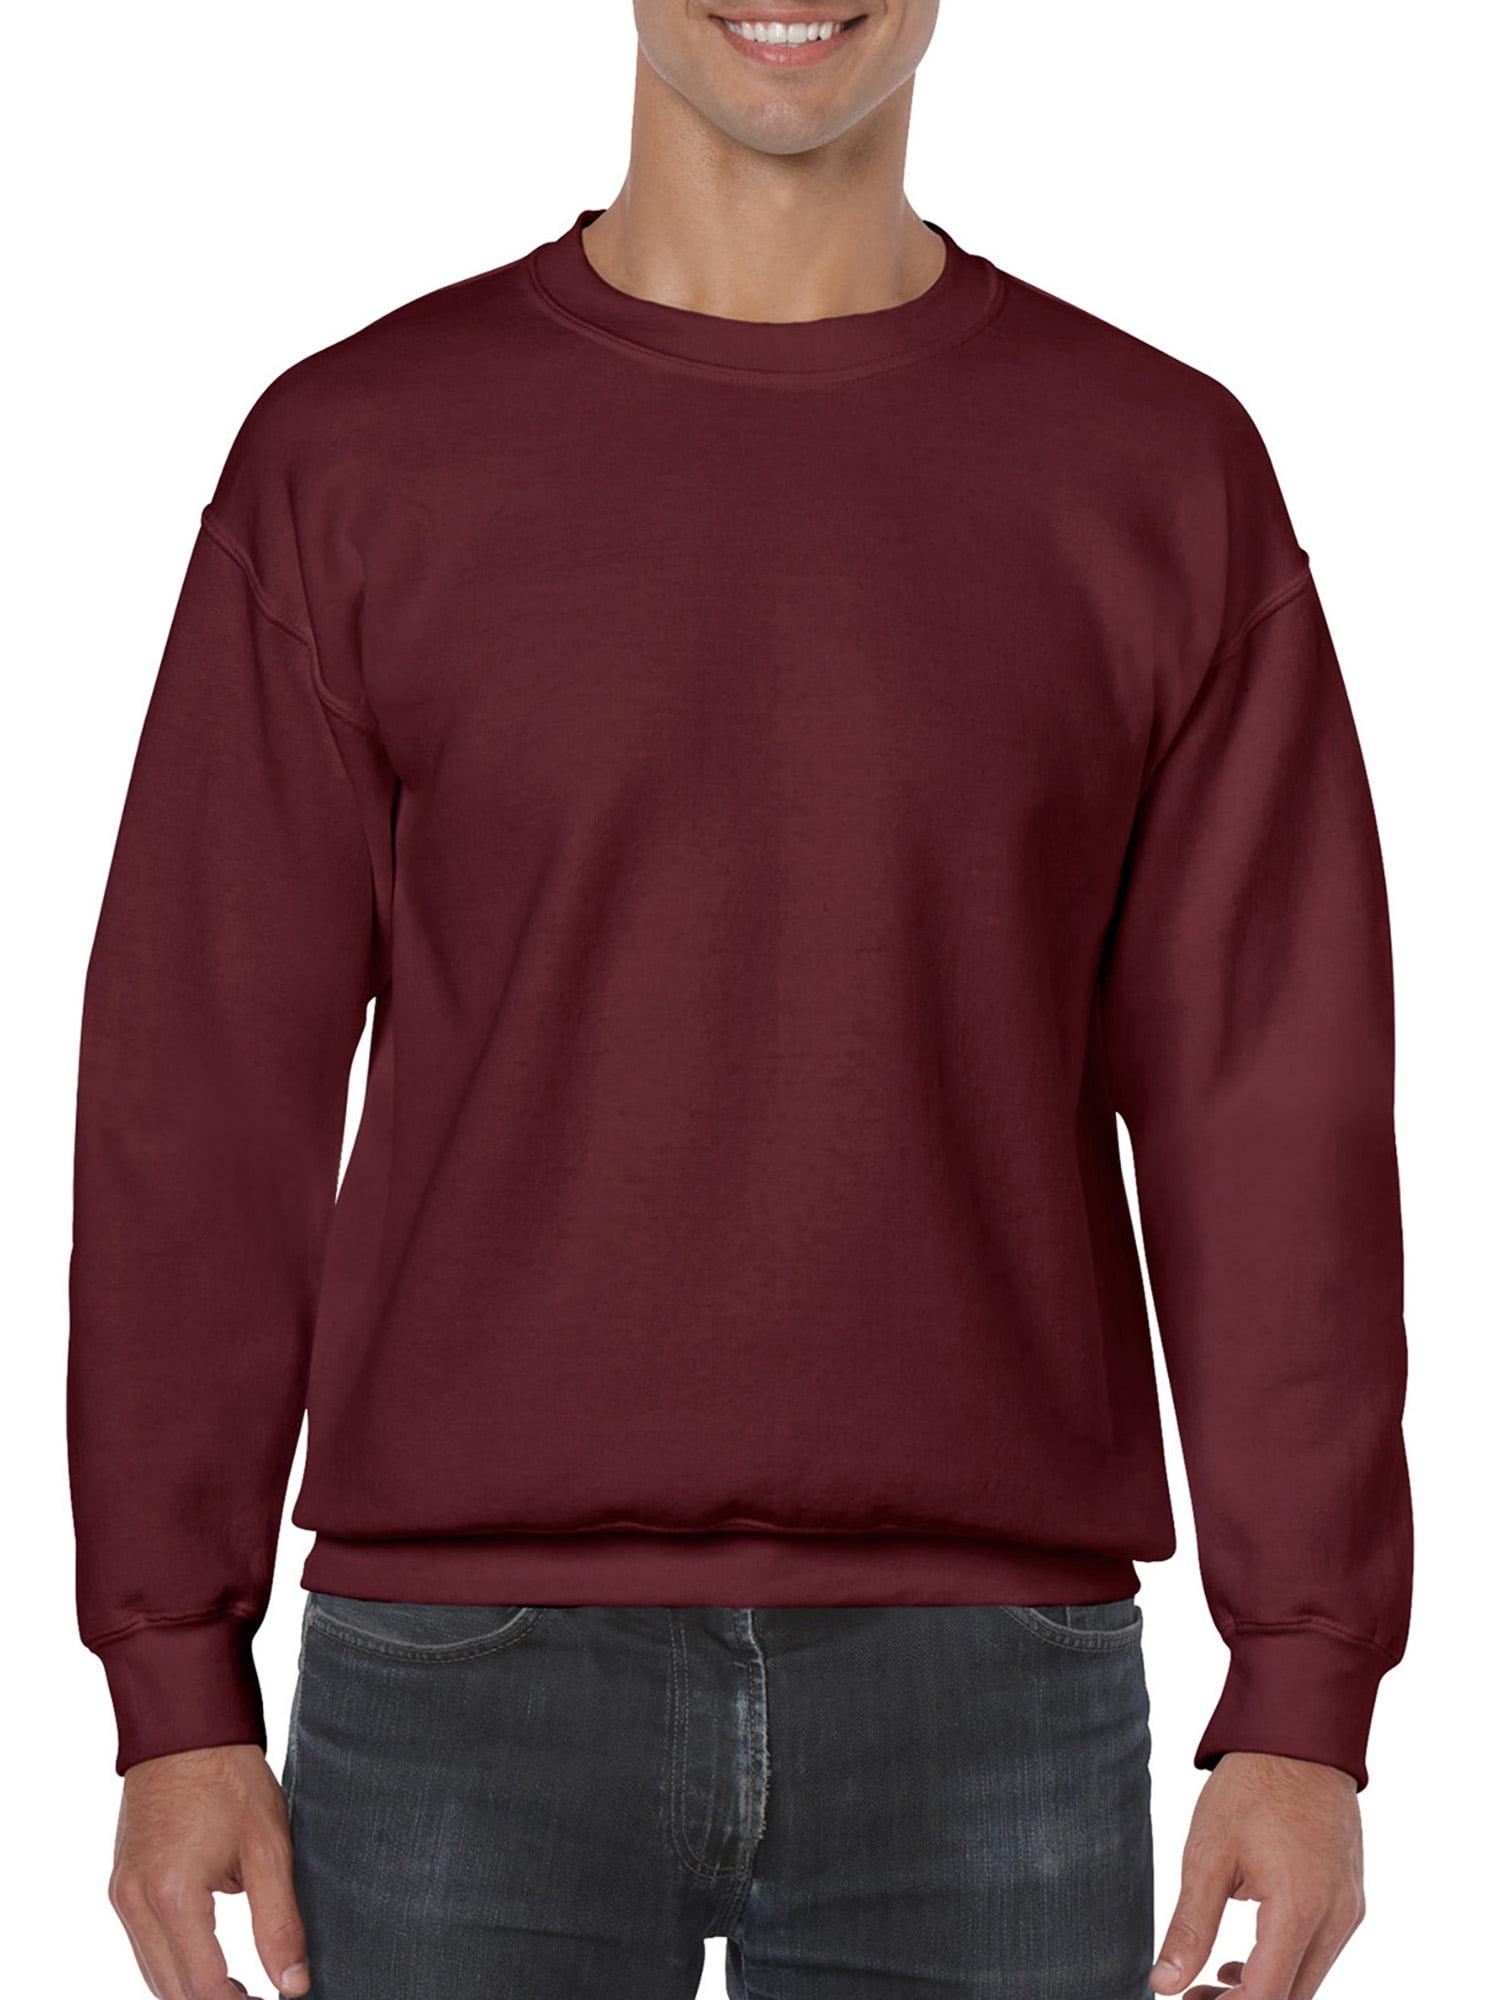 Big Mens Crewneck Sweatshirt